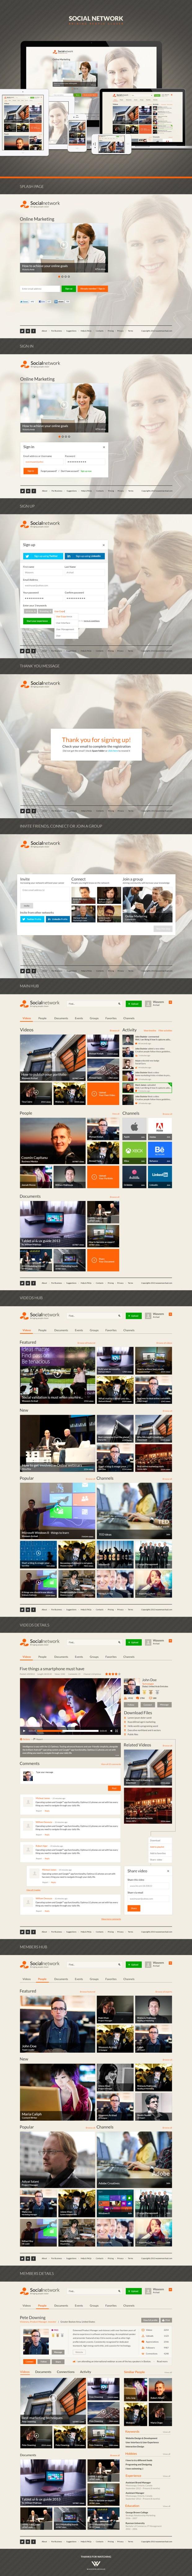 Social Network Design - Metro Style